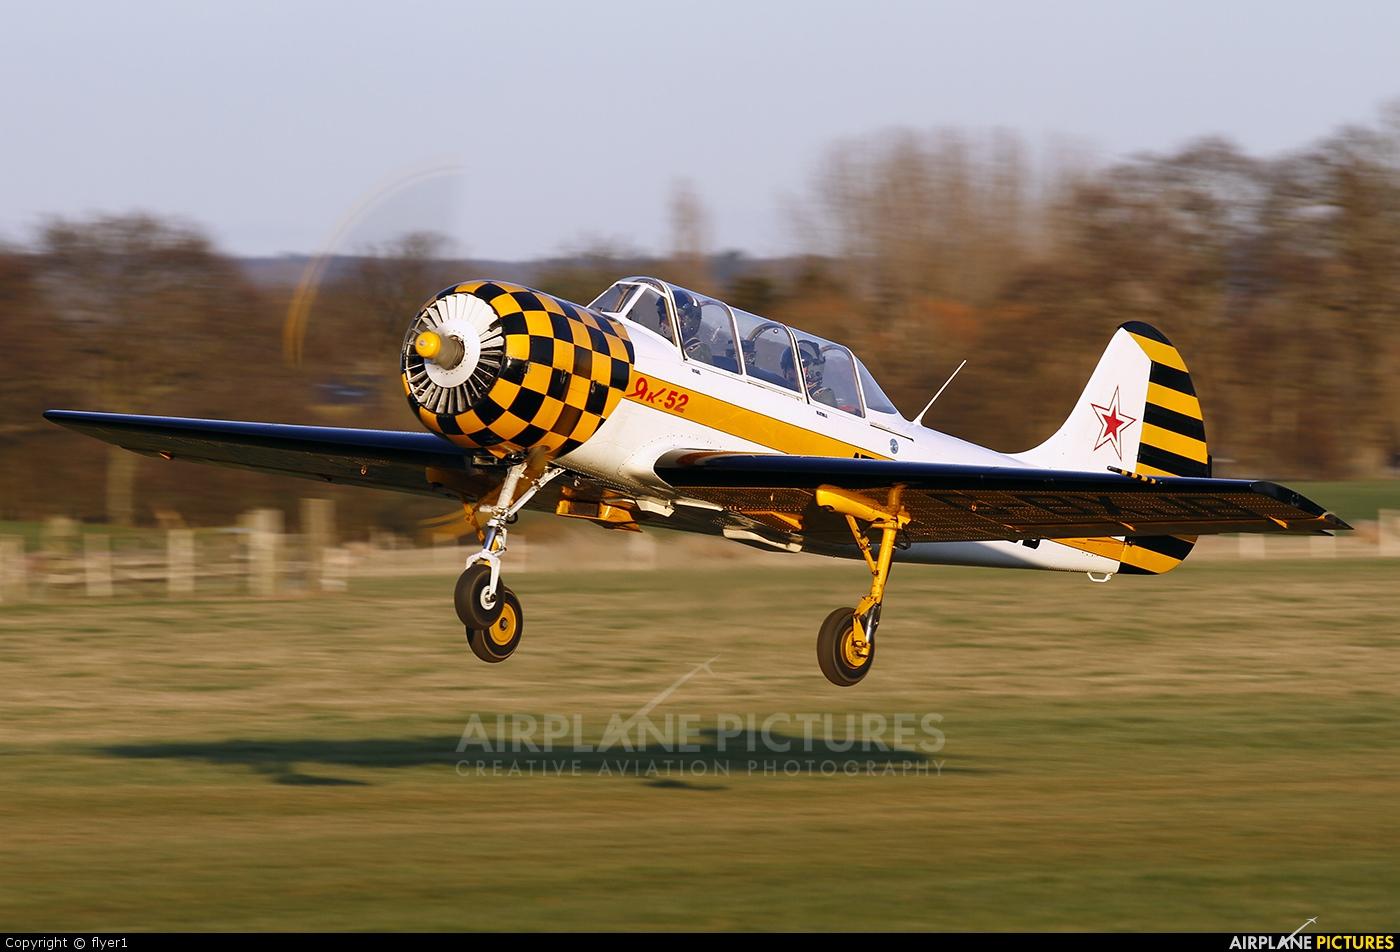 Private G-BXJB aircraft at Lashenden / Headcorn